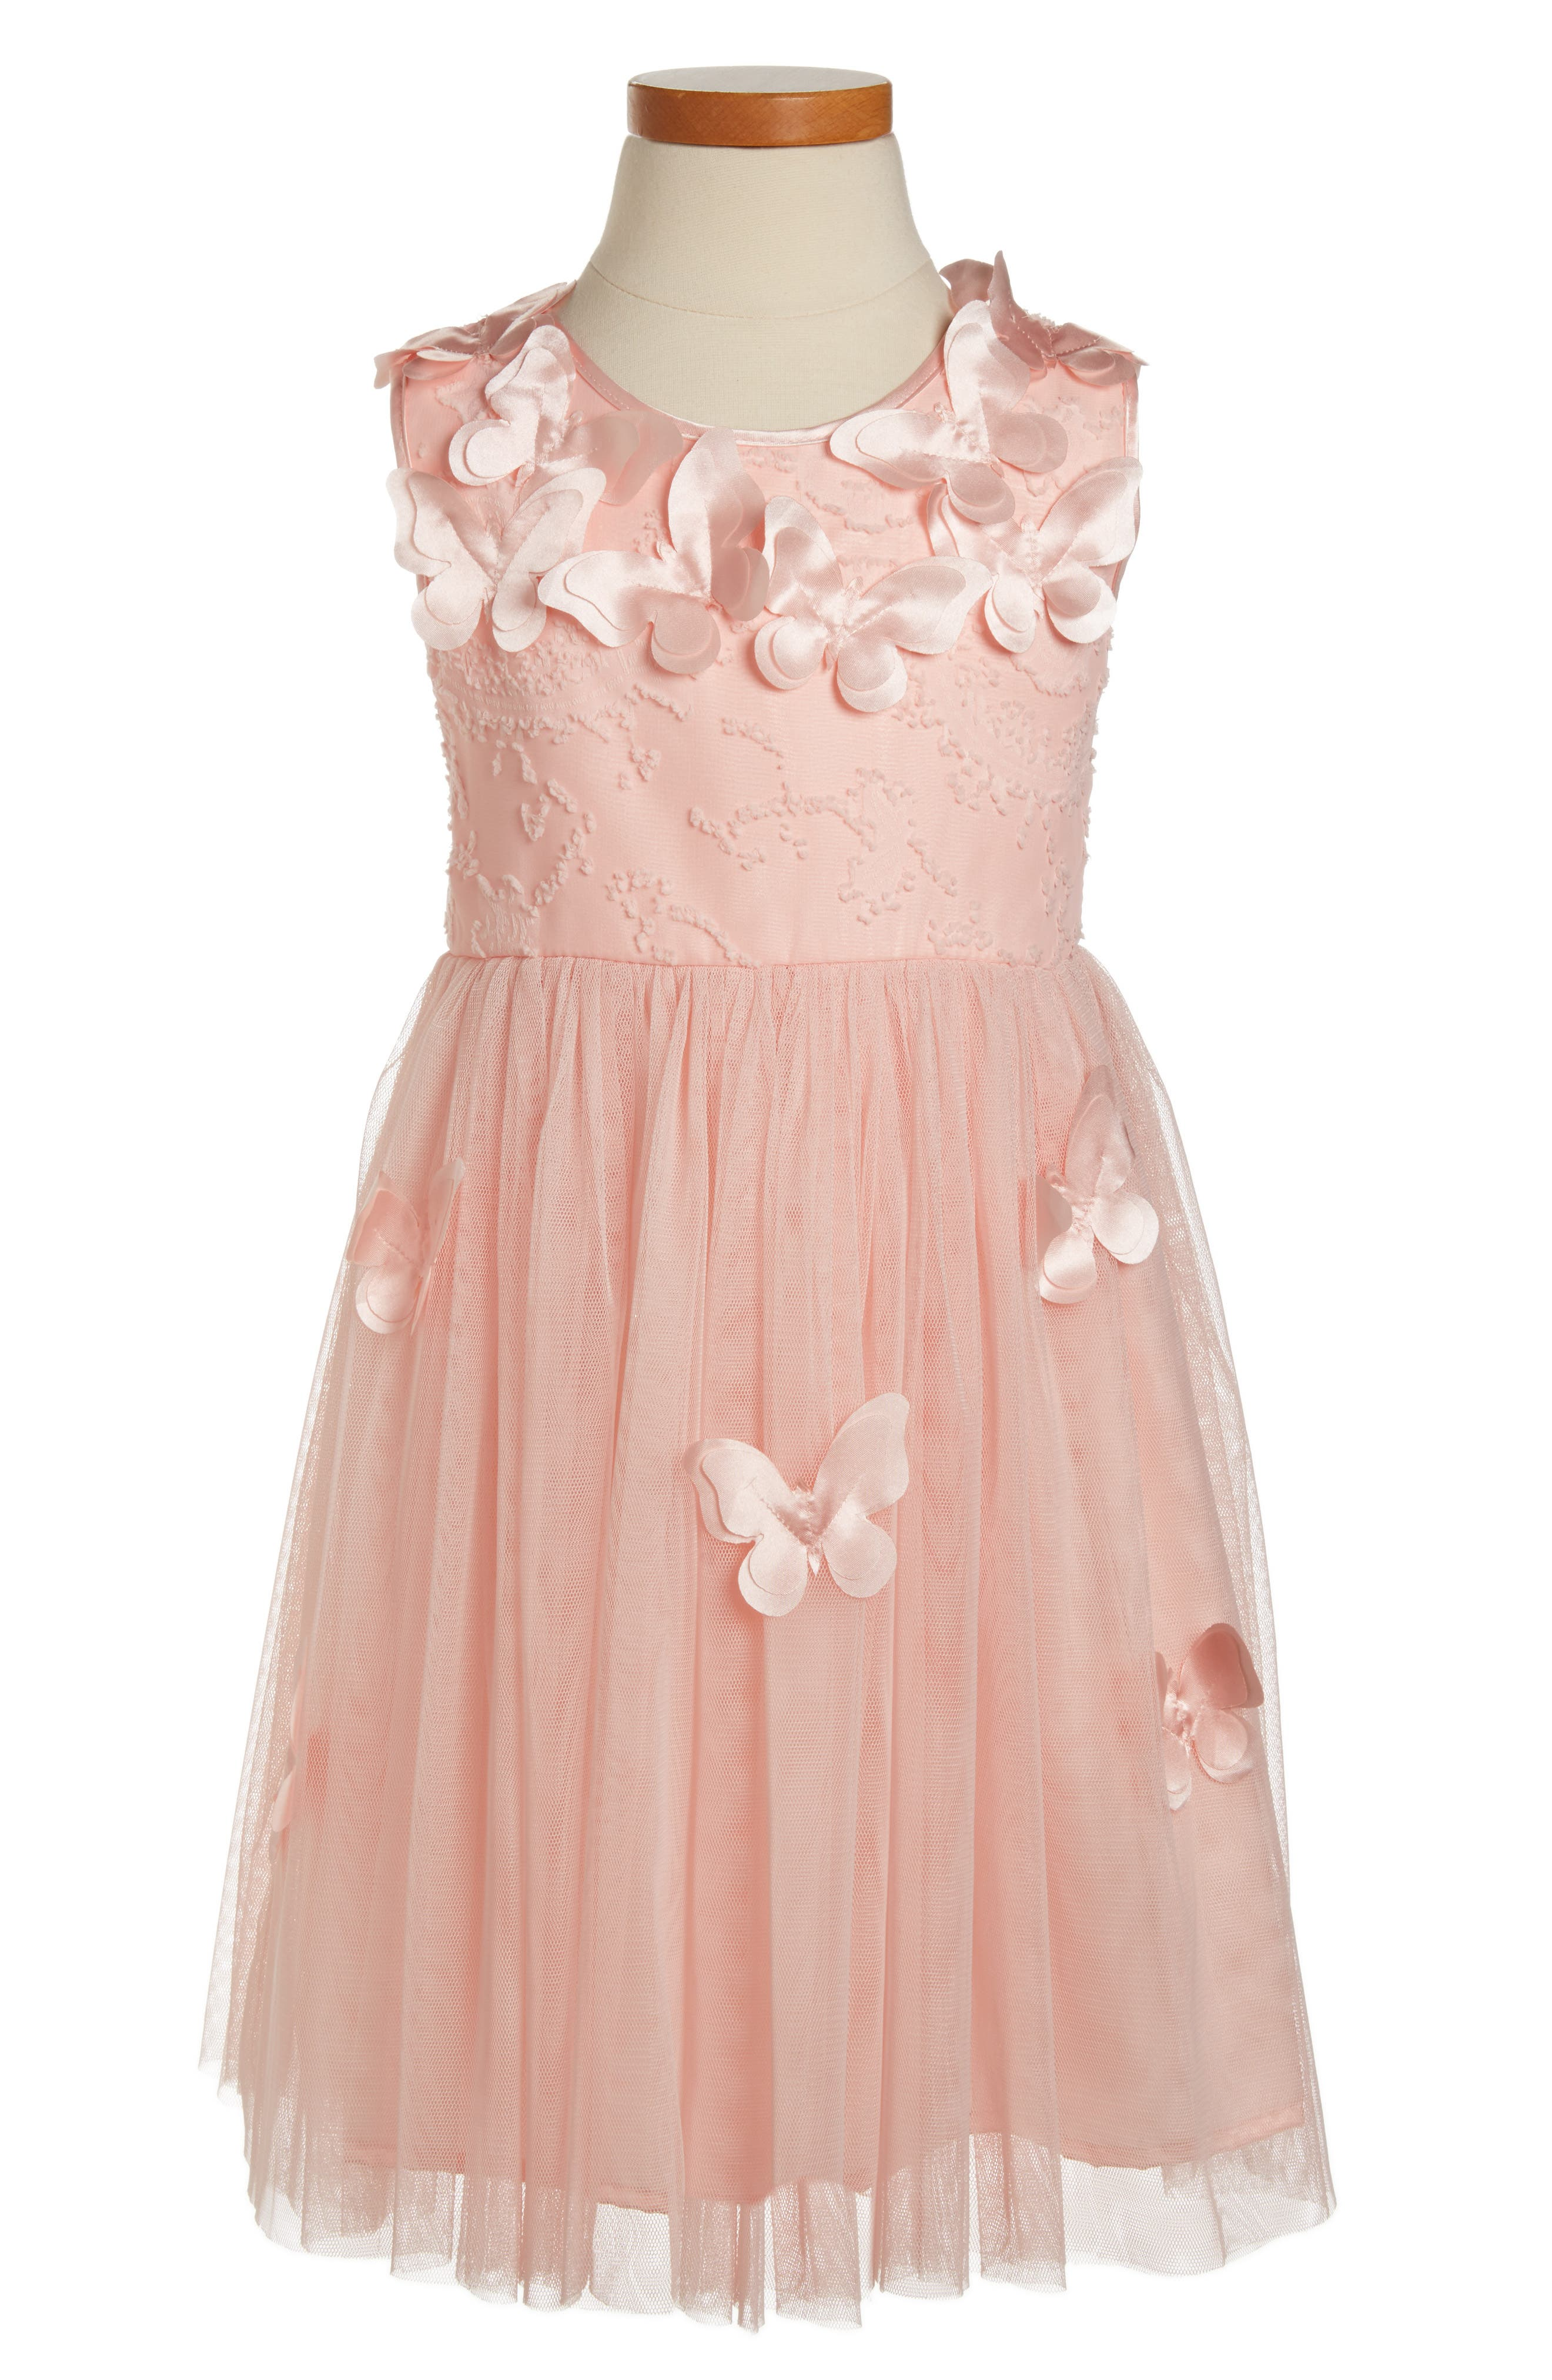 POPATU, Butterfly Dress, Main thumbnail 1, color, PEACH